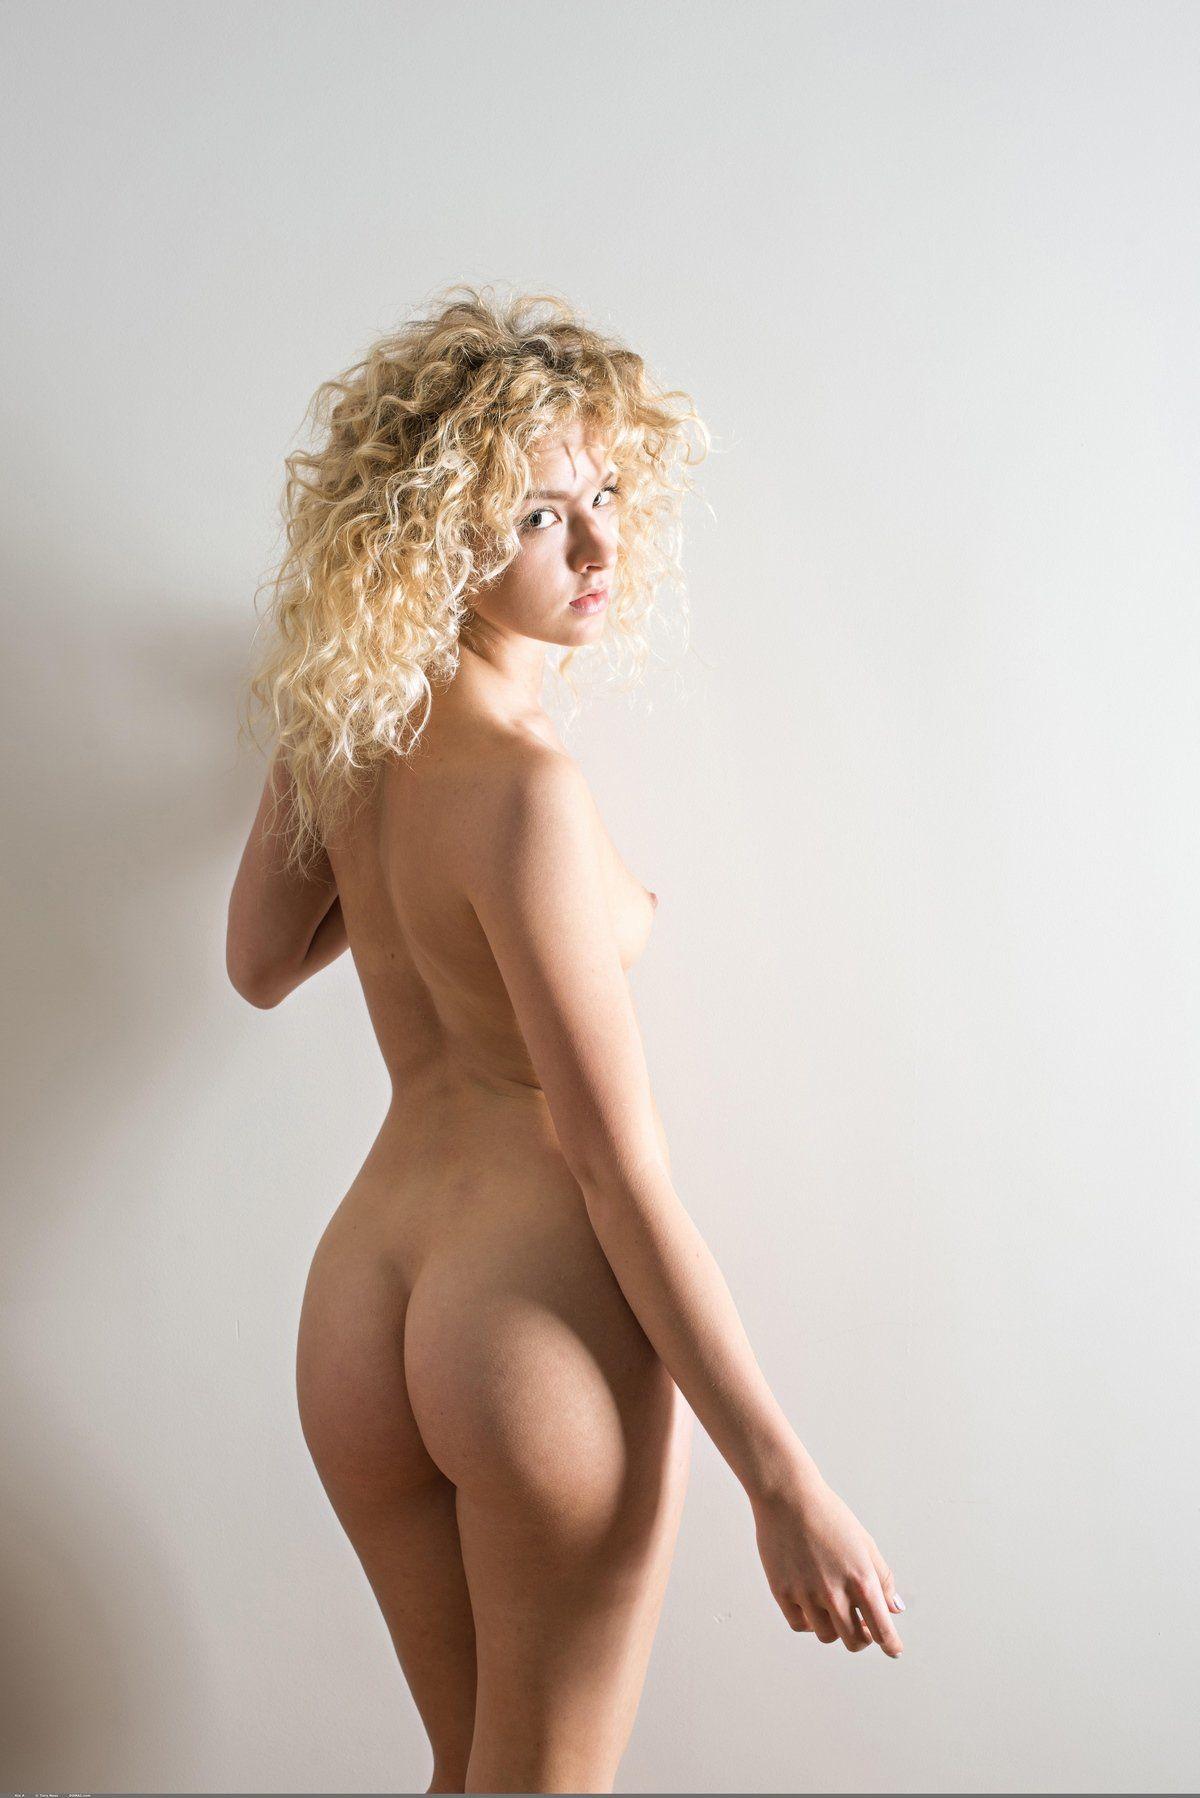 Curly Blonde Hair Girl Nude